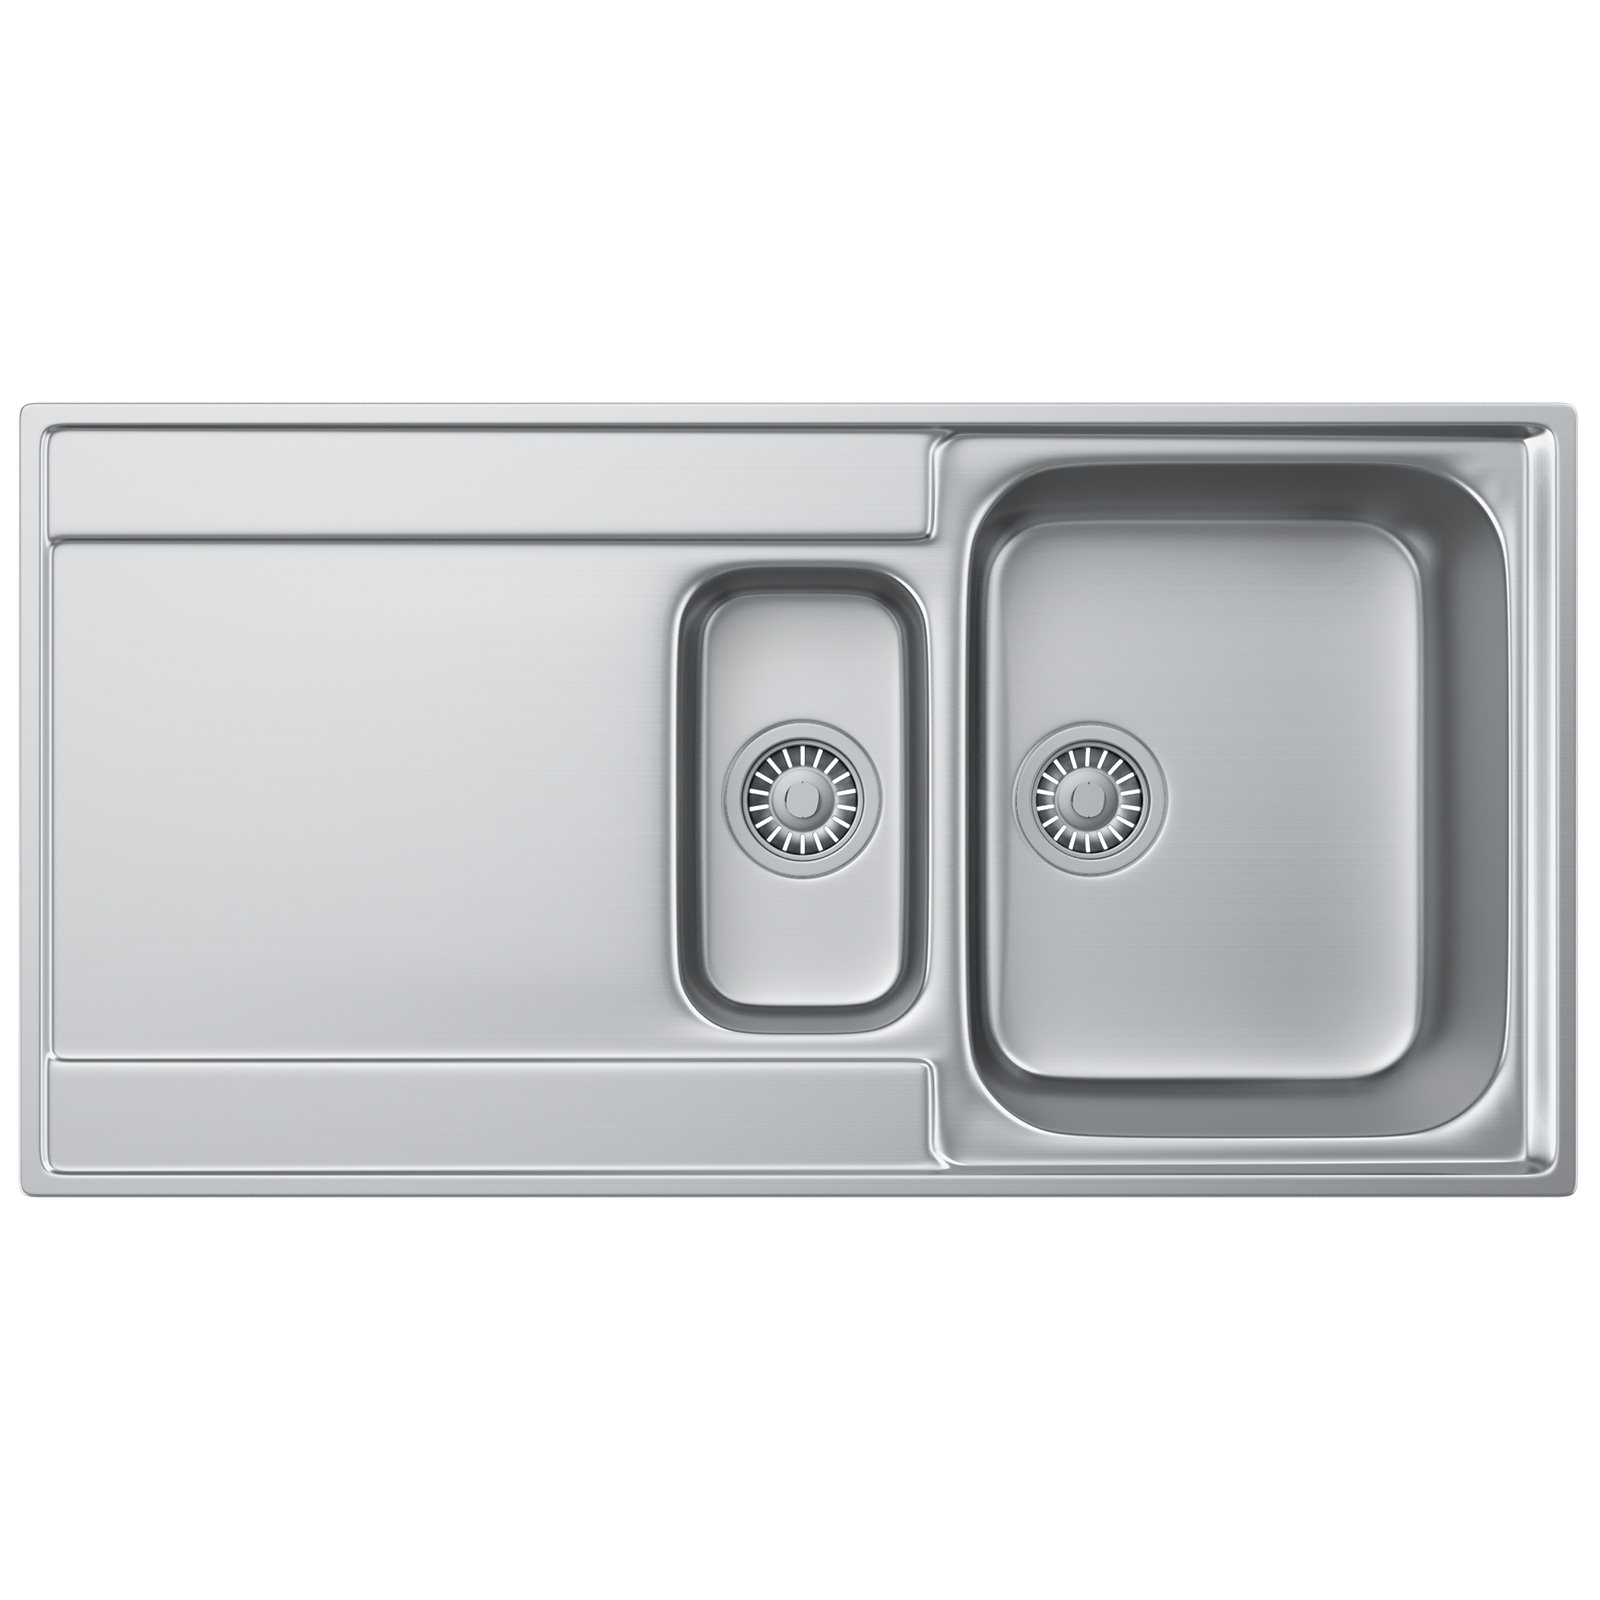 Franke Sink Tops : Franke Maris Slim-Top MRX 251 Stainless Steel 1.5 Bowl Kitchen Inset ...